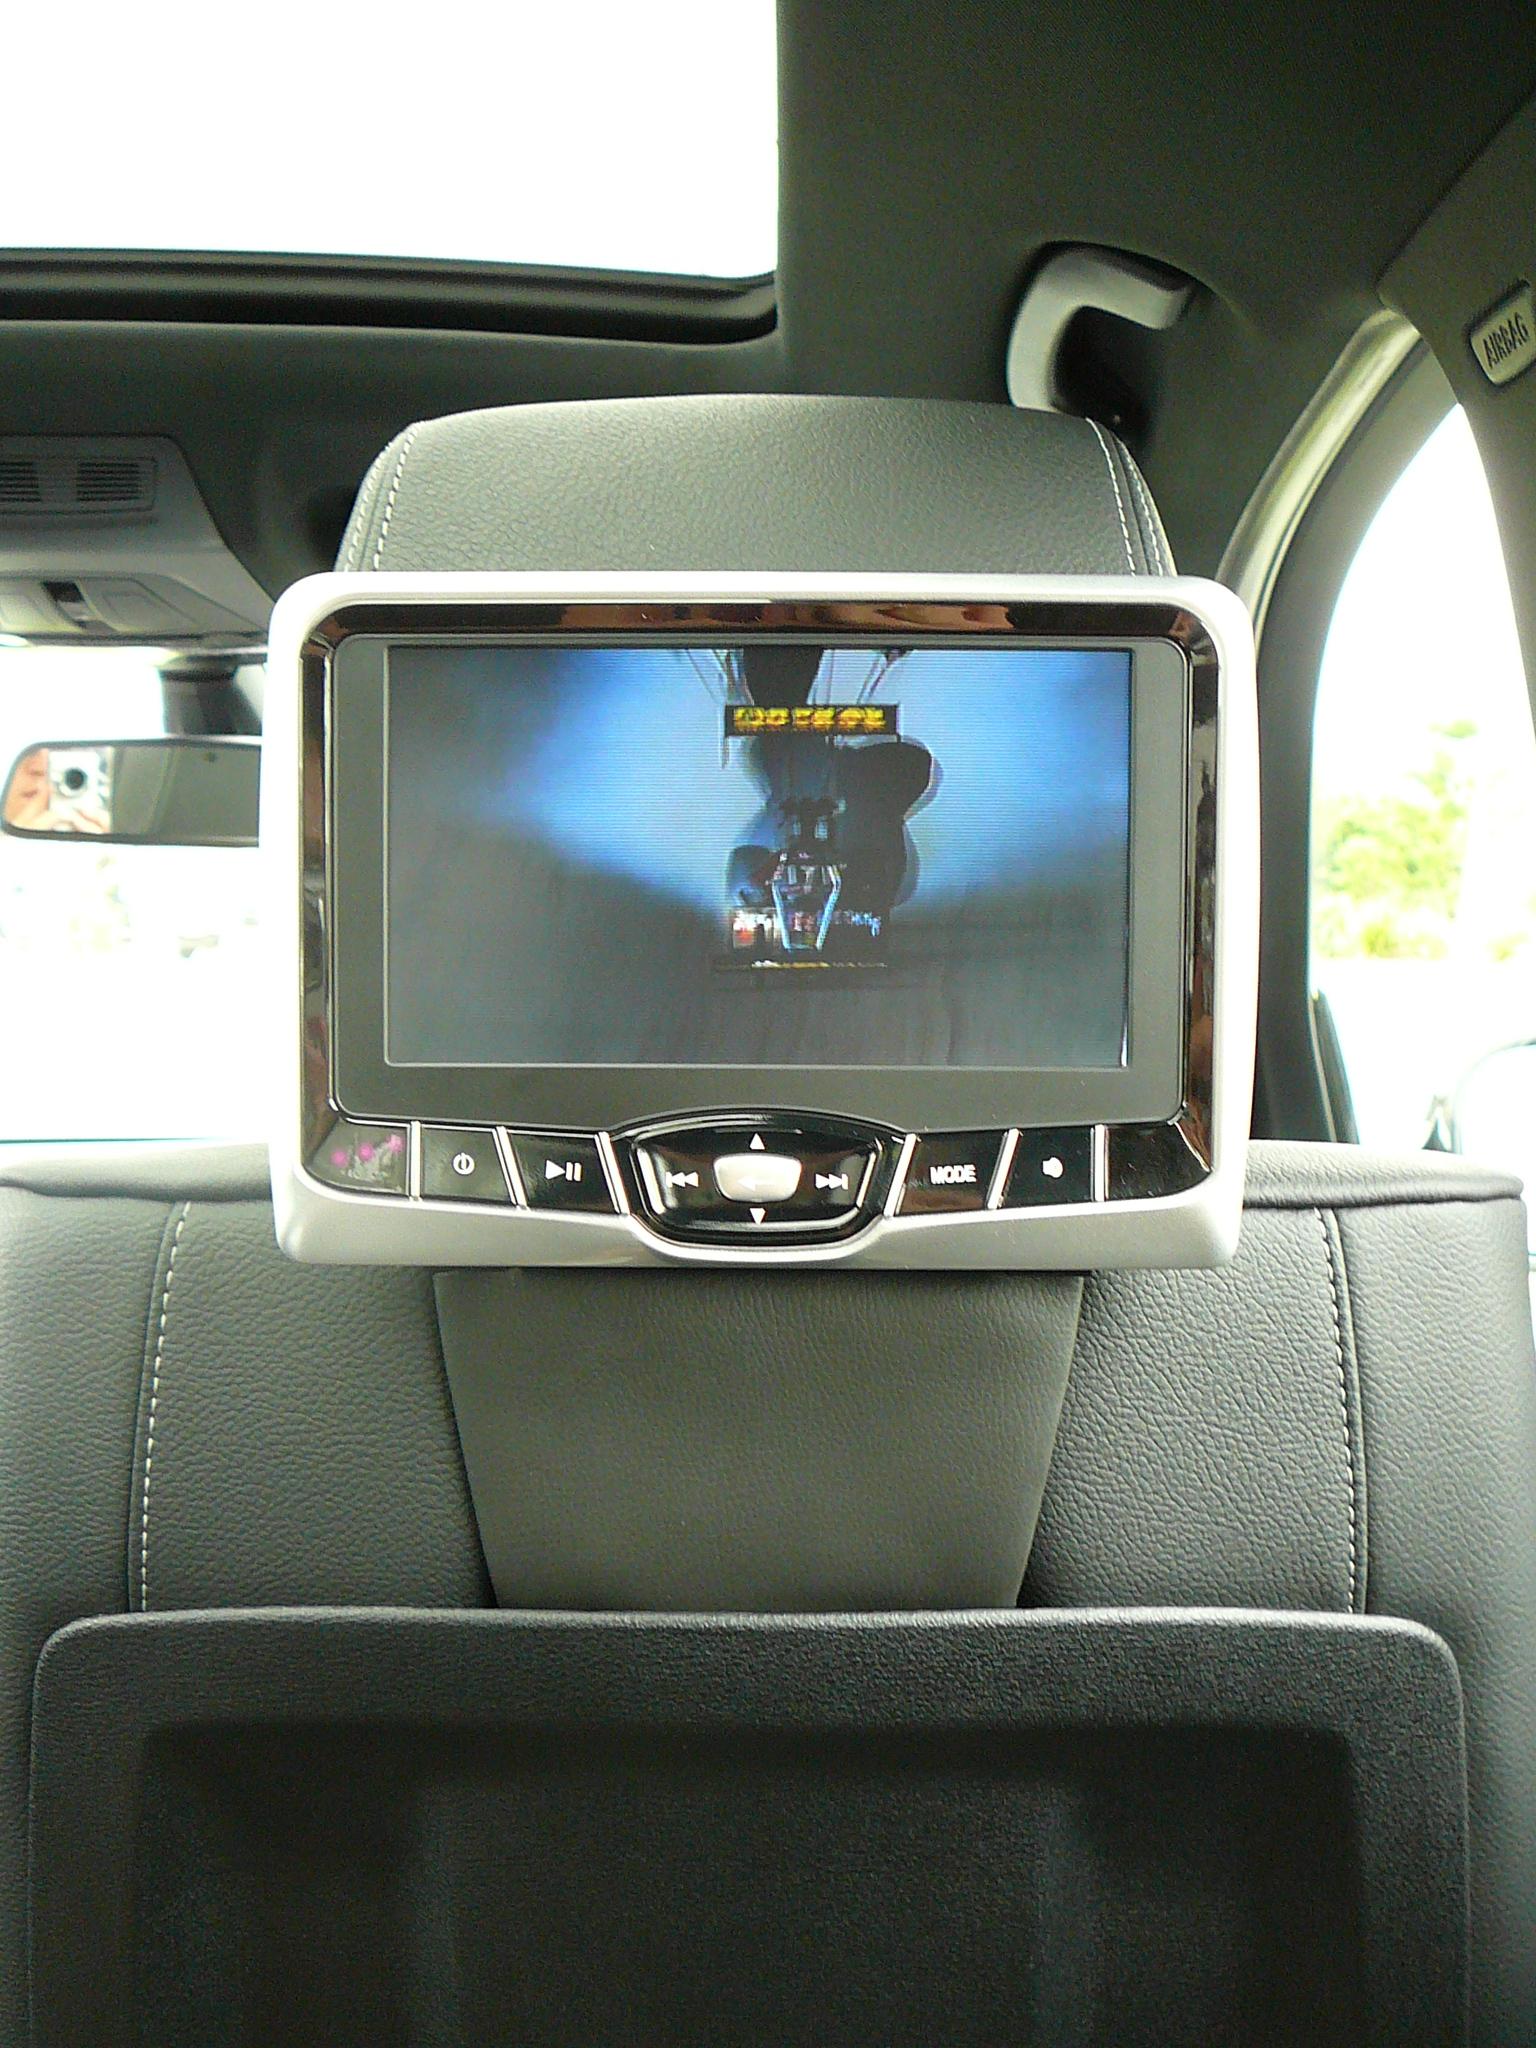 BMW X5 and BMW X3 rear seat DVD upgrade with Rosen AV-7700